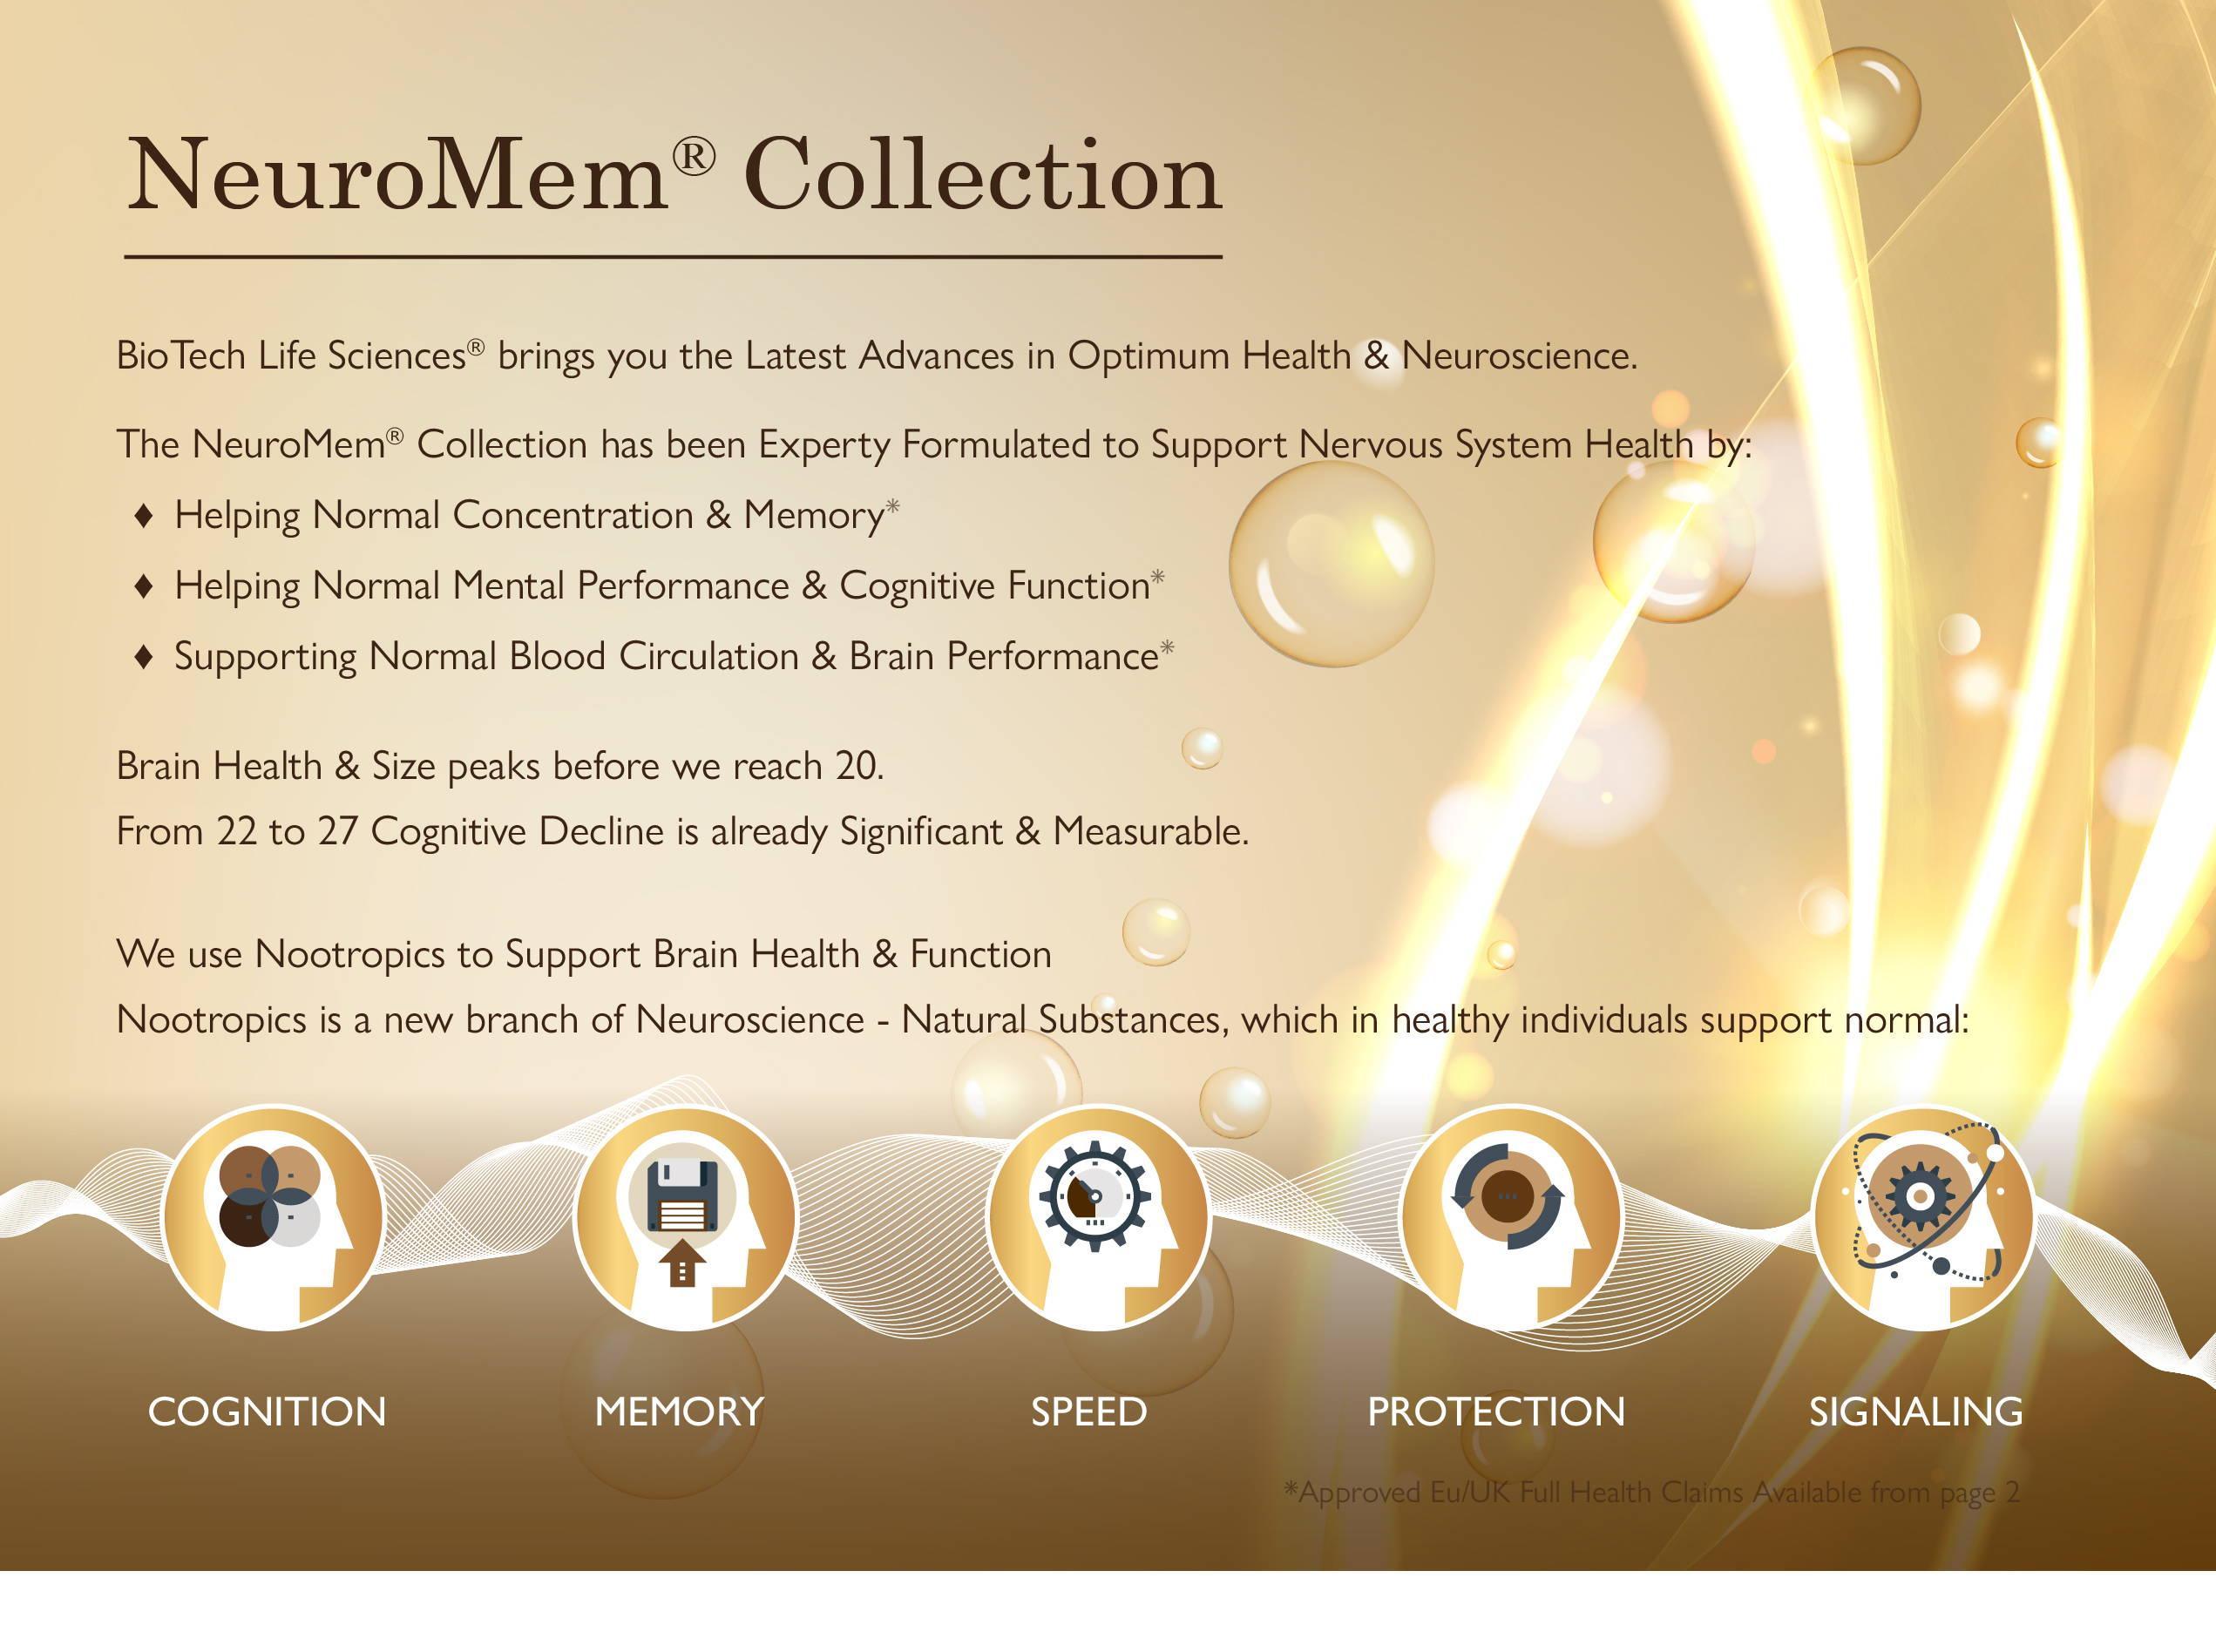 NeuroMem Collection